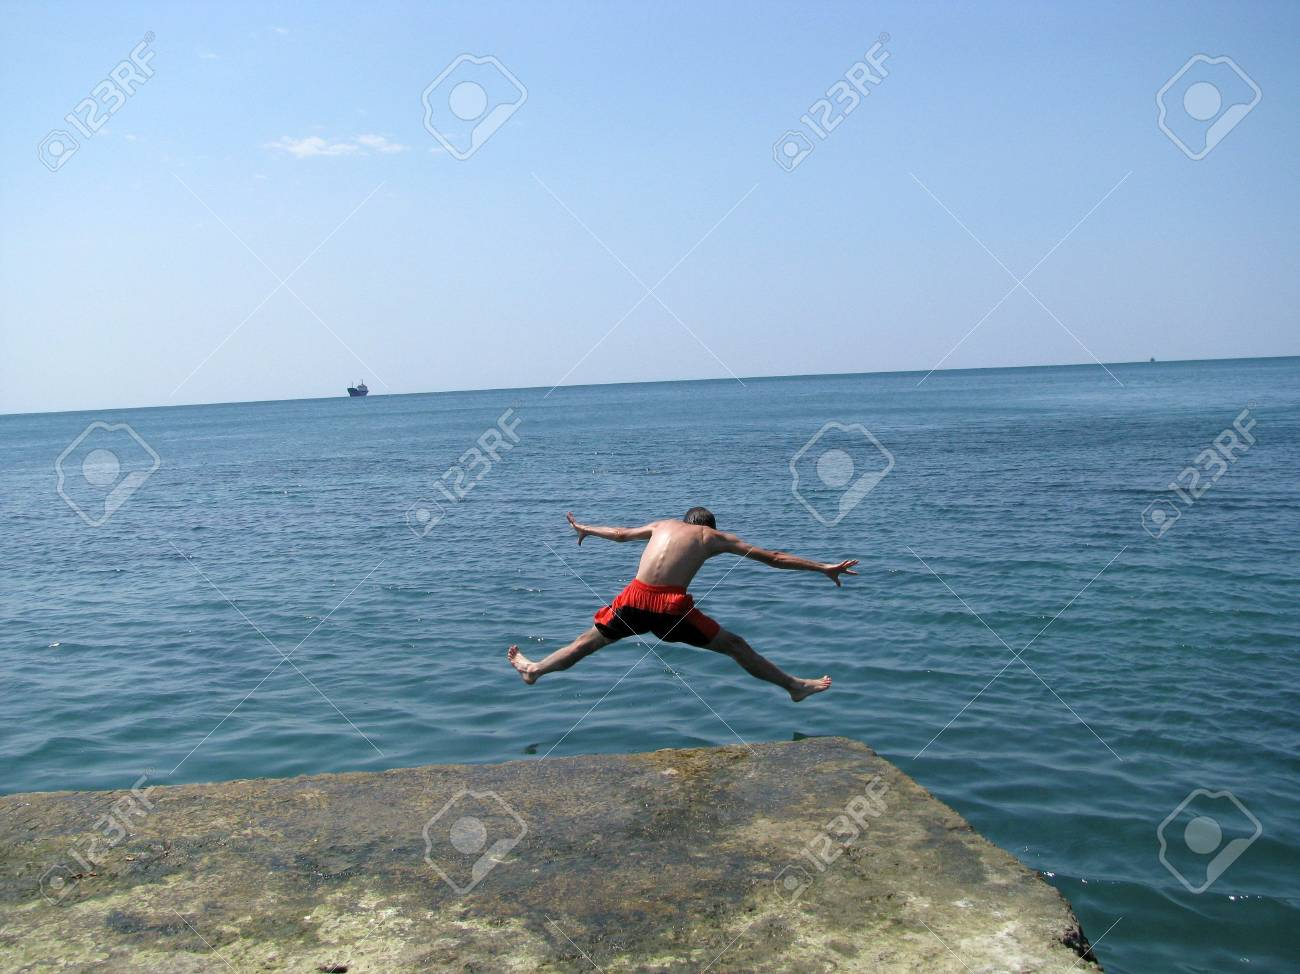 do not repeat, dangerously, horizon, diver Stock Photo - 3851369